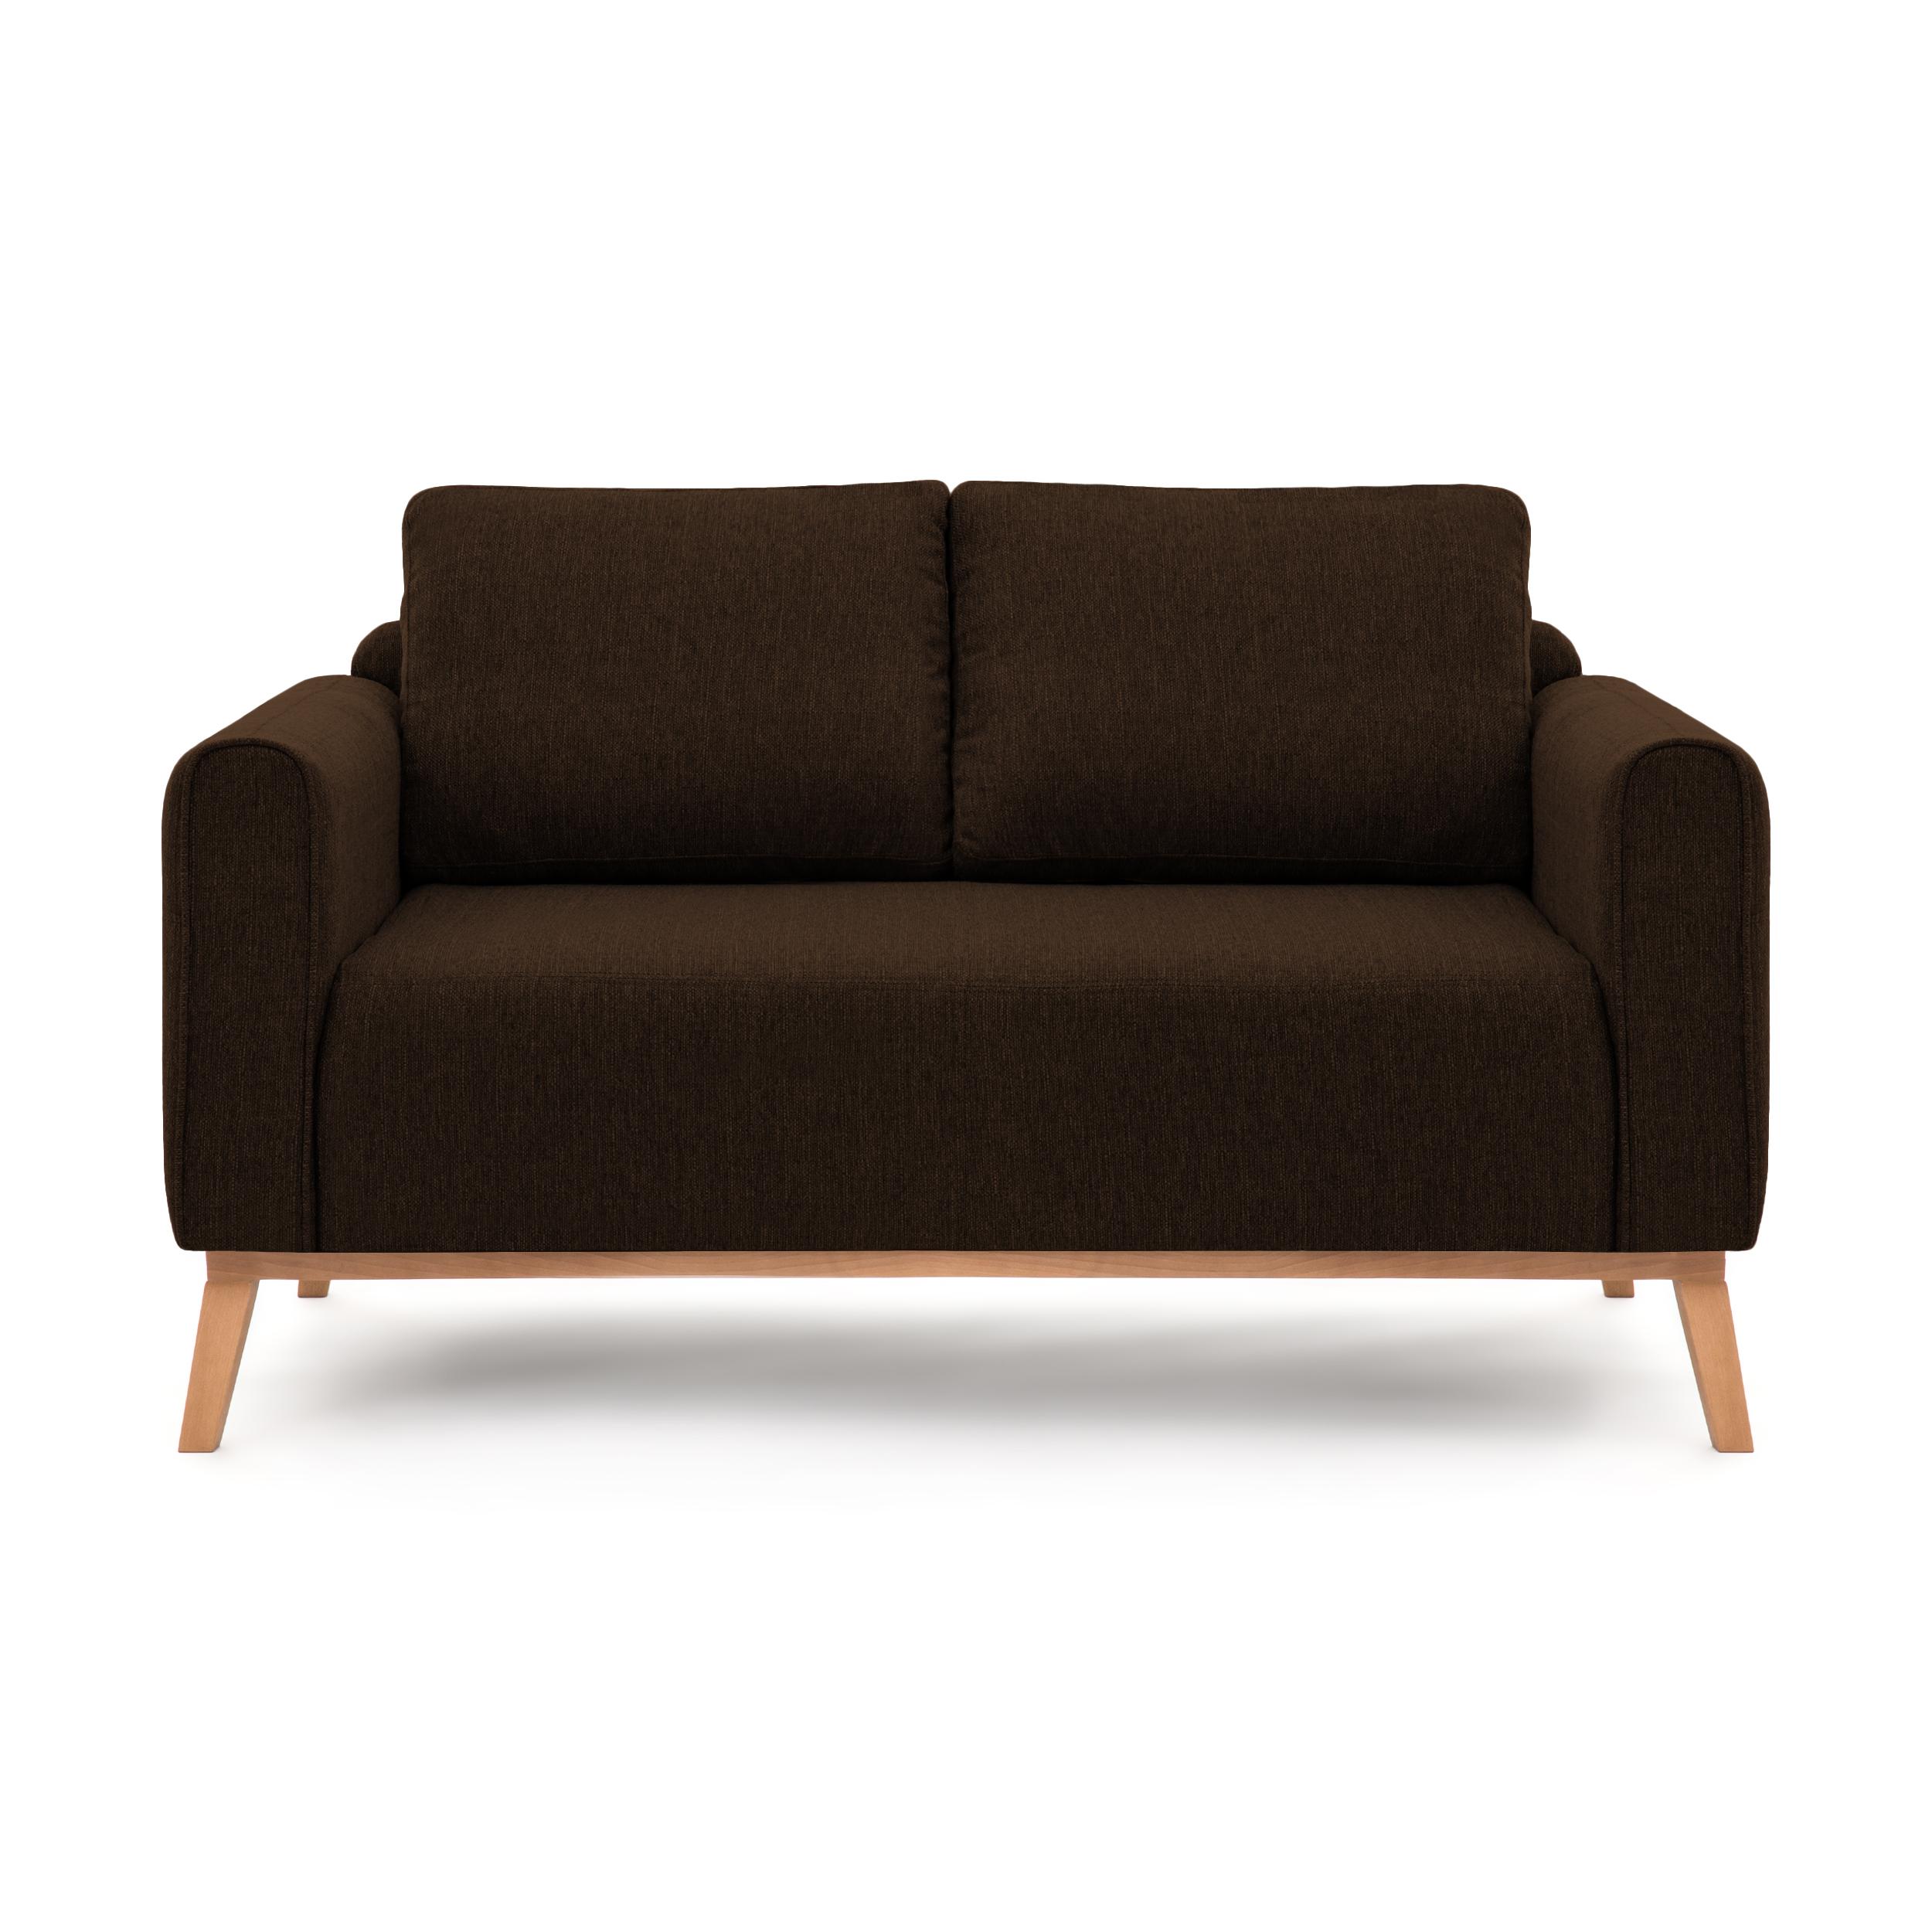 Canapea Fixa 2 locuri Milton Dark Brown